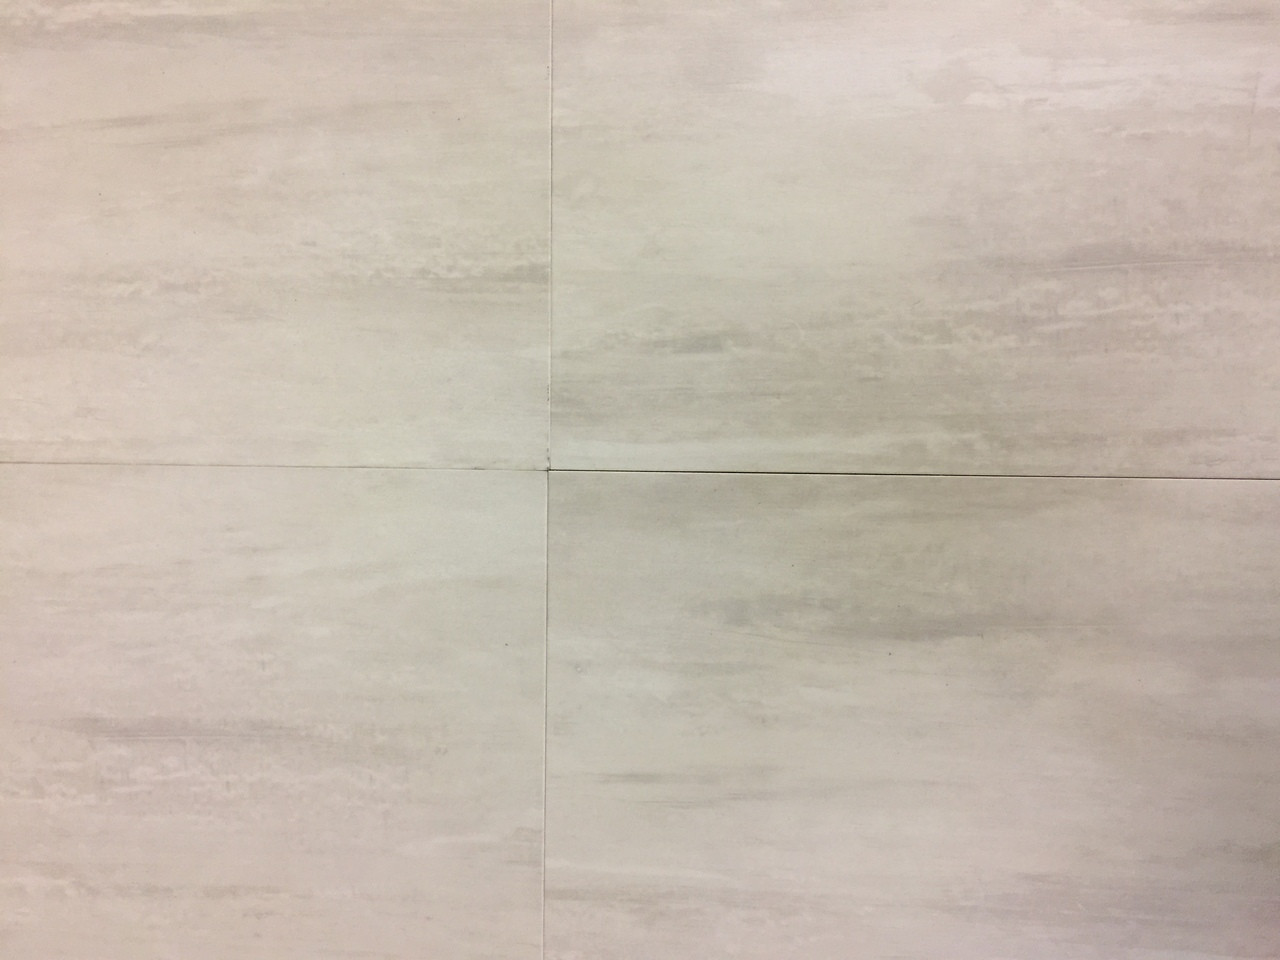 nafco permastone groutfil 16 x 16 elegant 1 89 sq ft